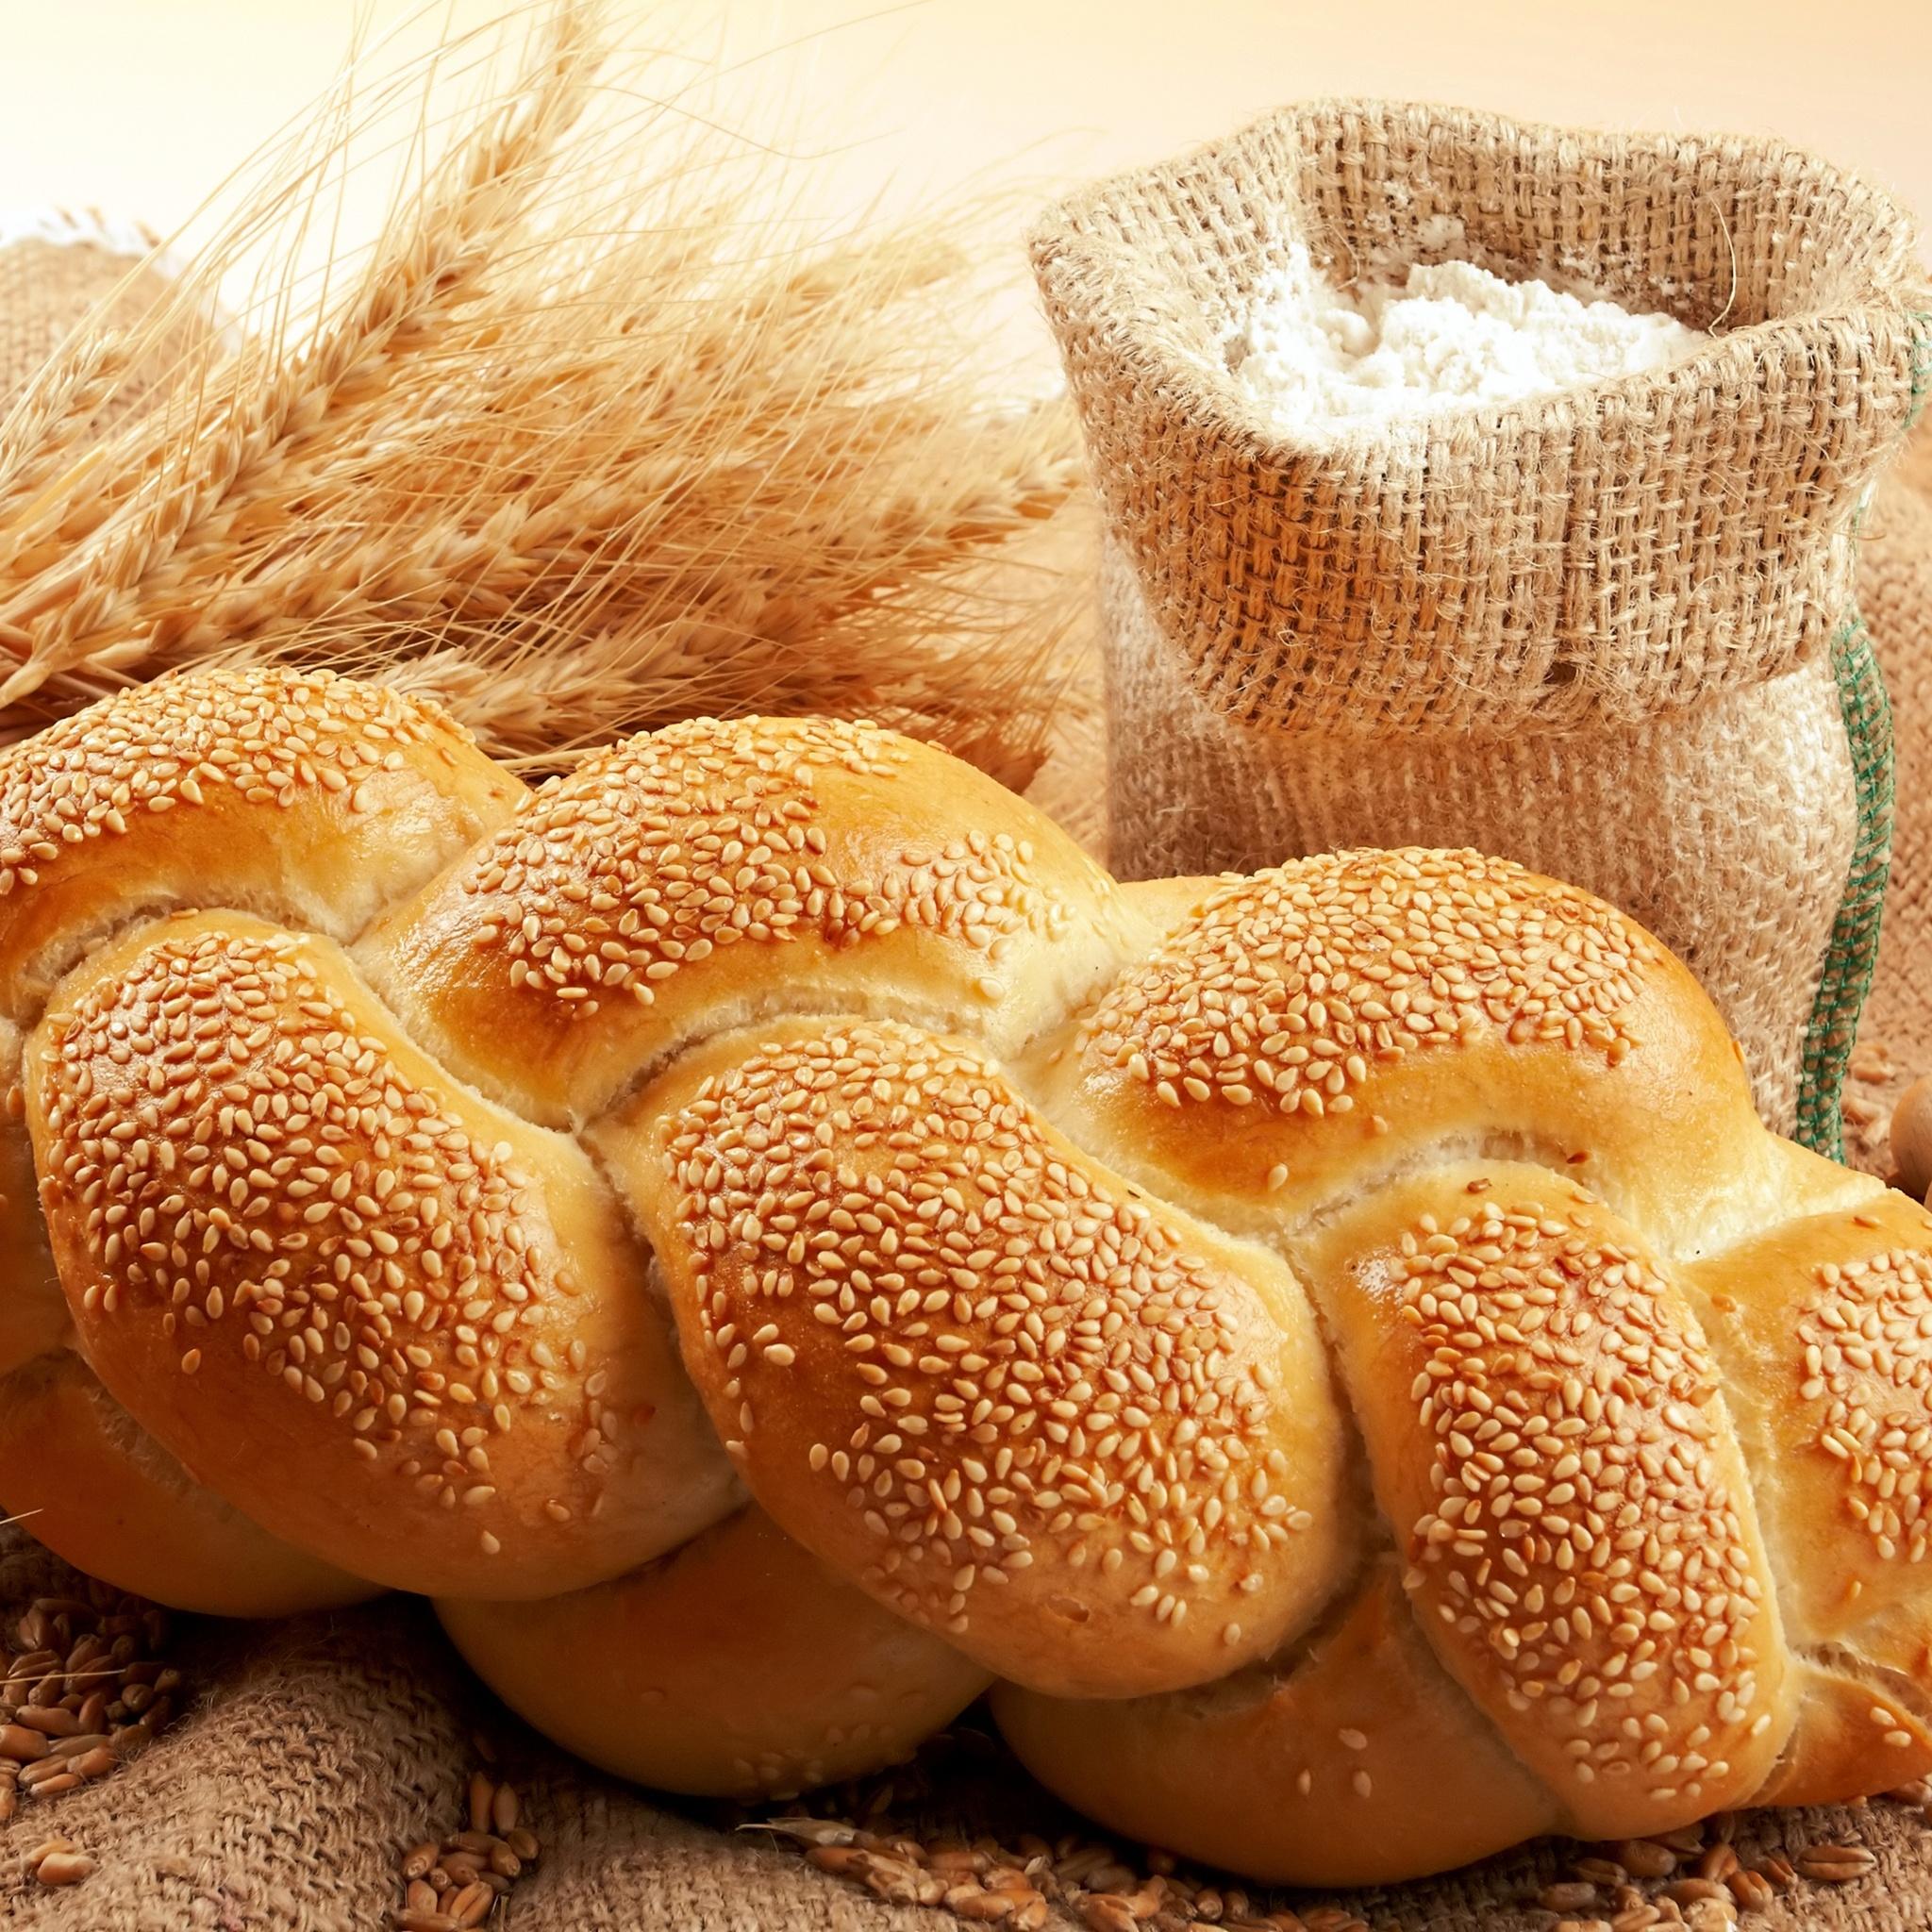 Килограмм зерна на килограмм хлеба: кривая арифметика российского АПК